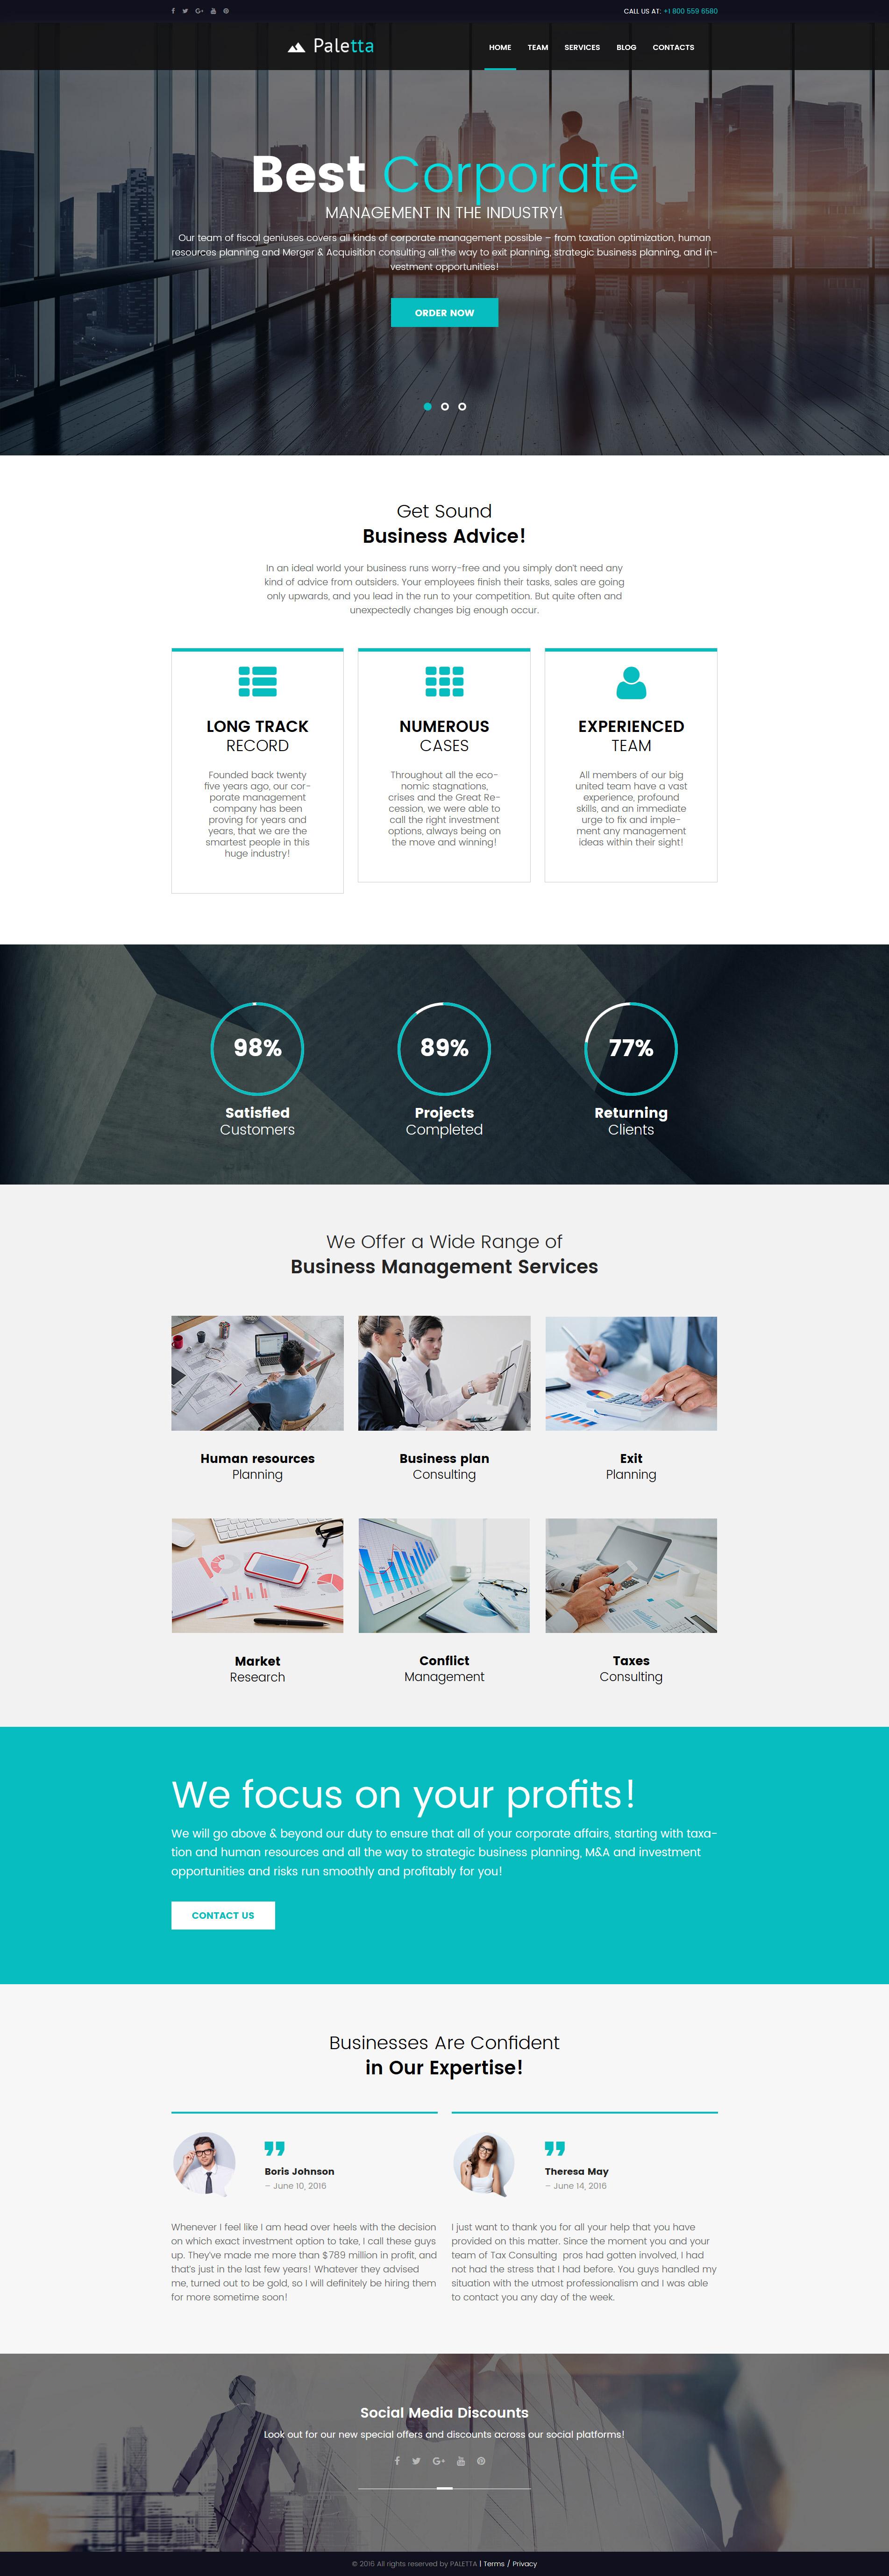 Paletta для сайта бизнес-компании №62119 - скриншот